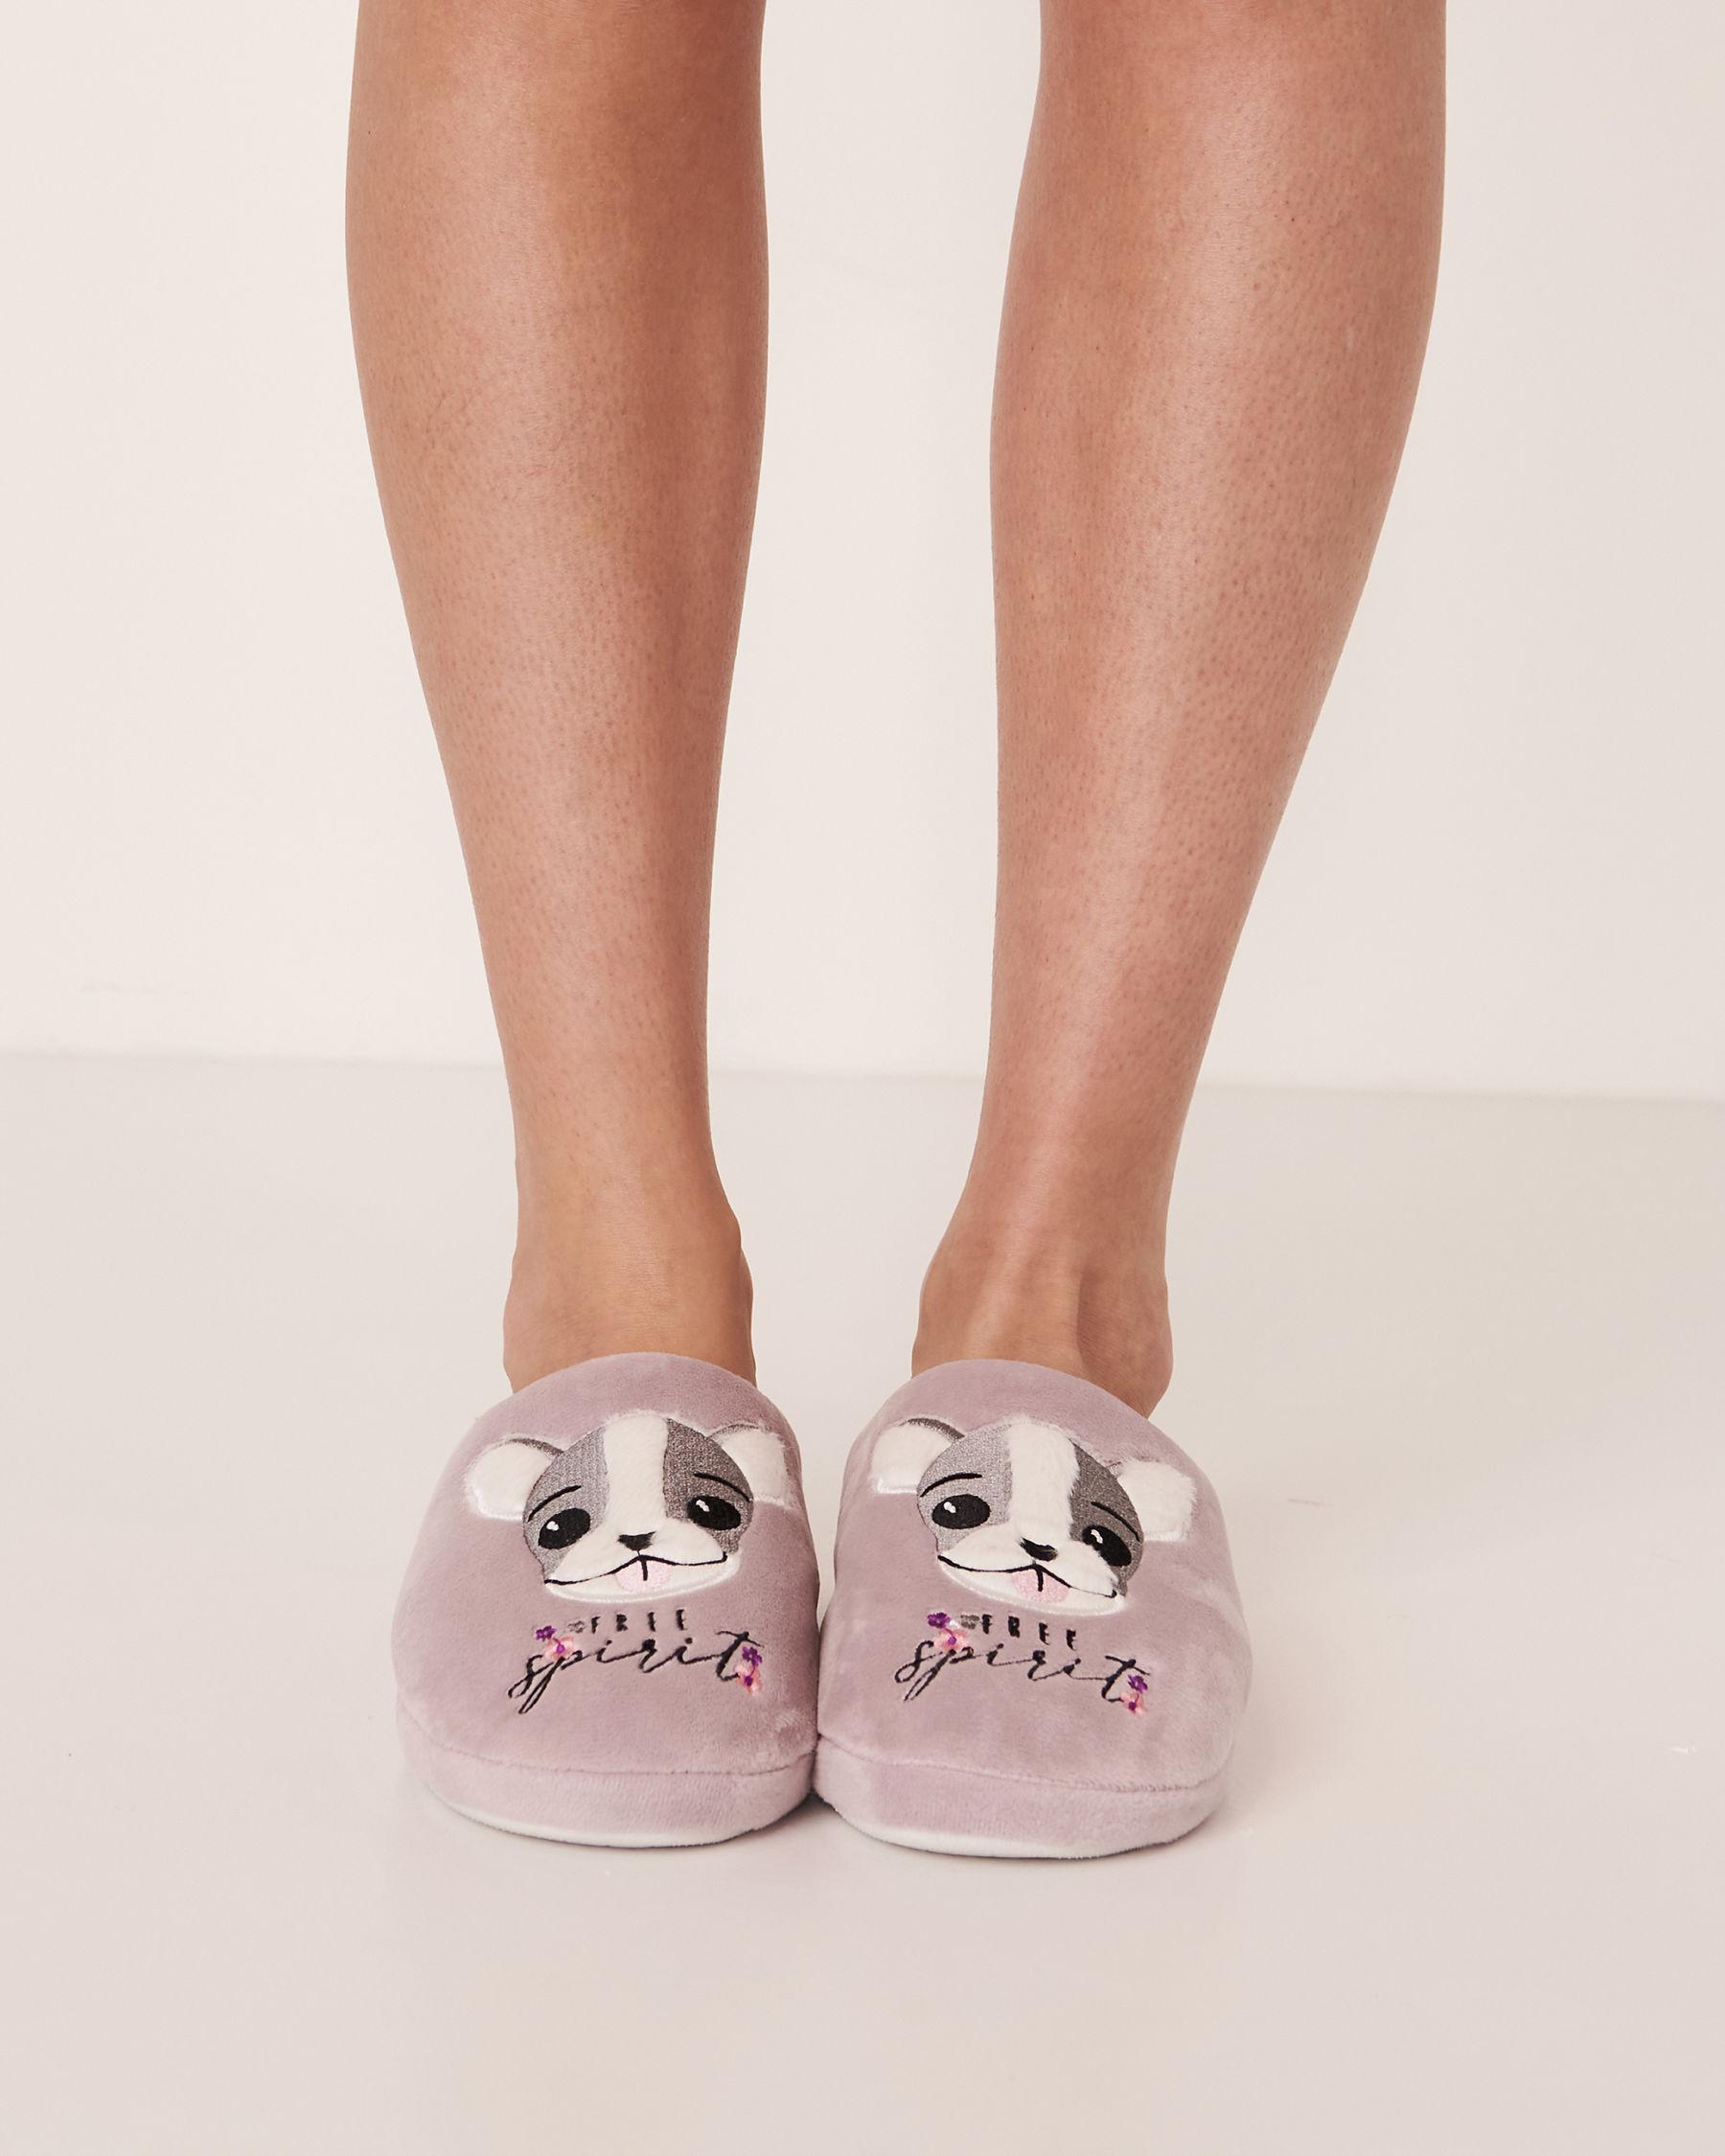 LA VIE EN ROSE Clog Slippers Lilac 40700018 - View3